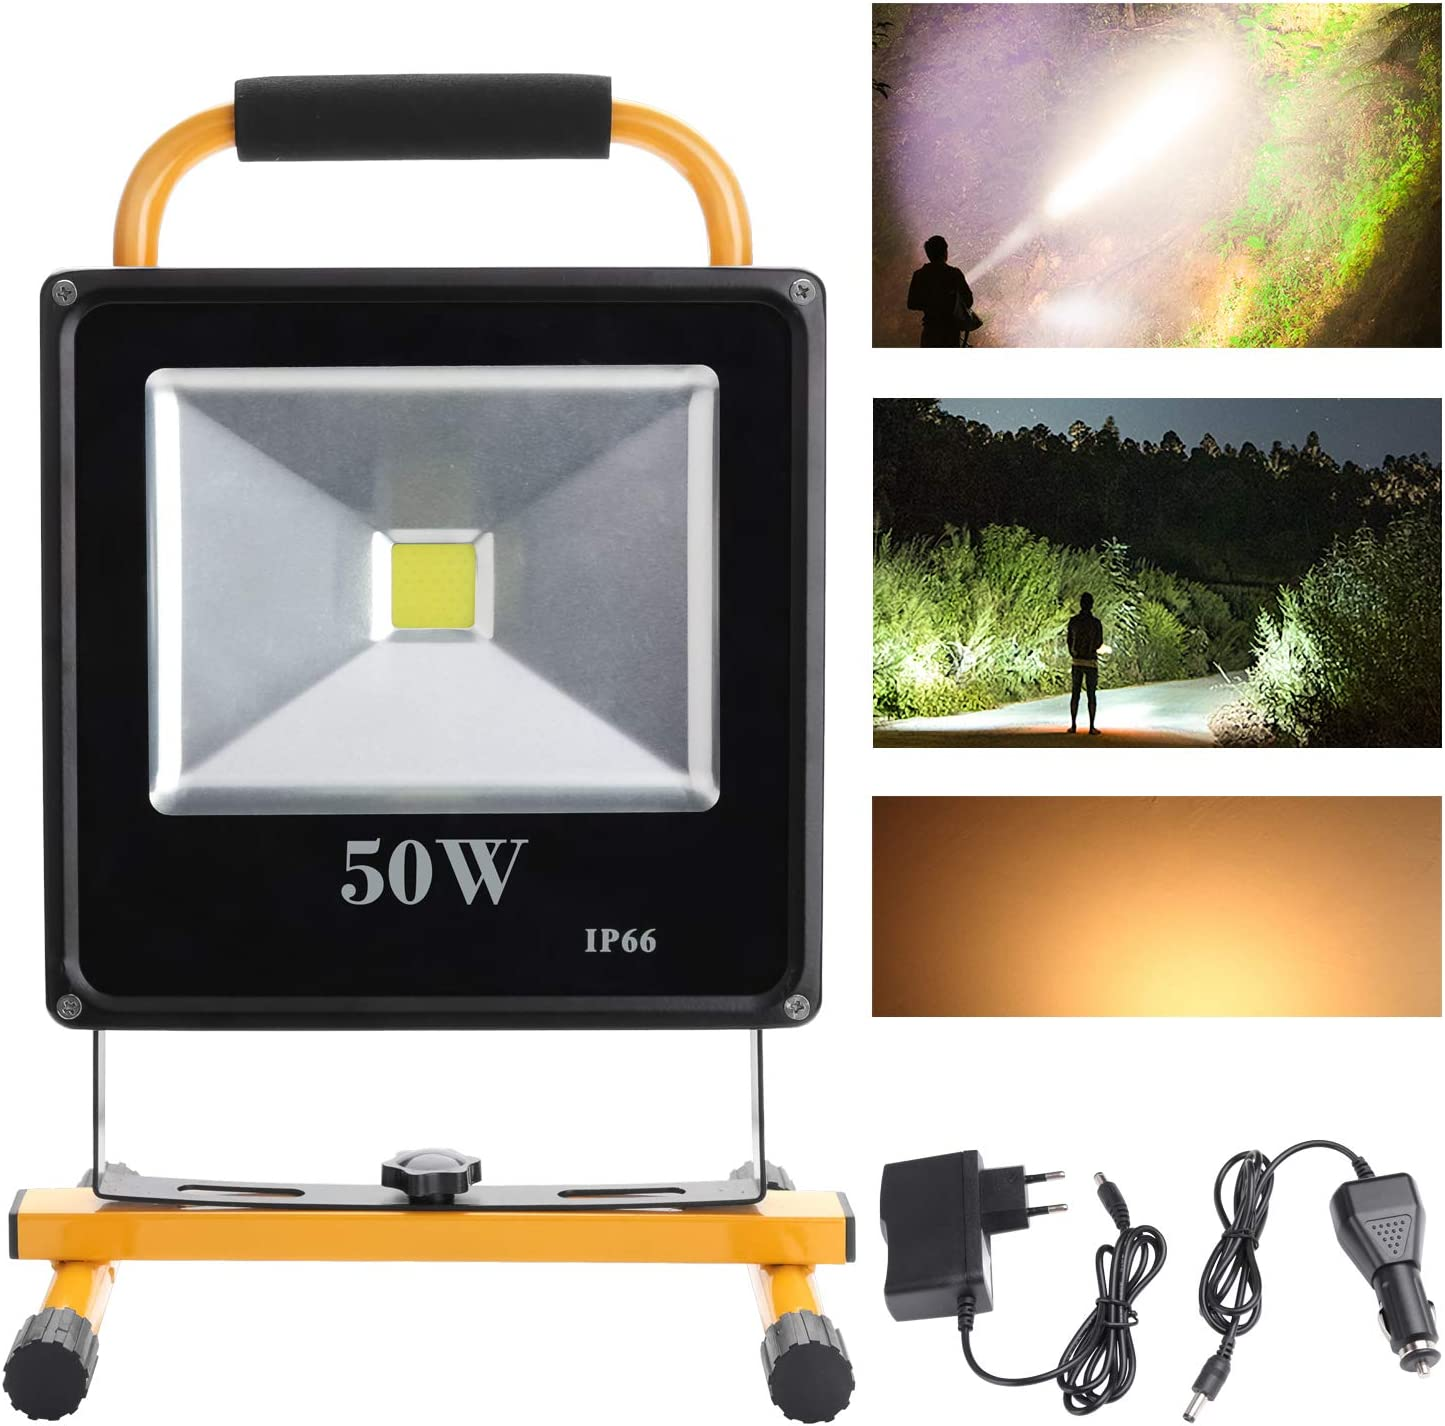 Hengda® 50W Blanco Cálido LED Foco proyector Recargable del Jardín al Aire Libre, Patio, Terraza, Pescado, Camping, Luz Protector Portátil